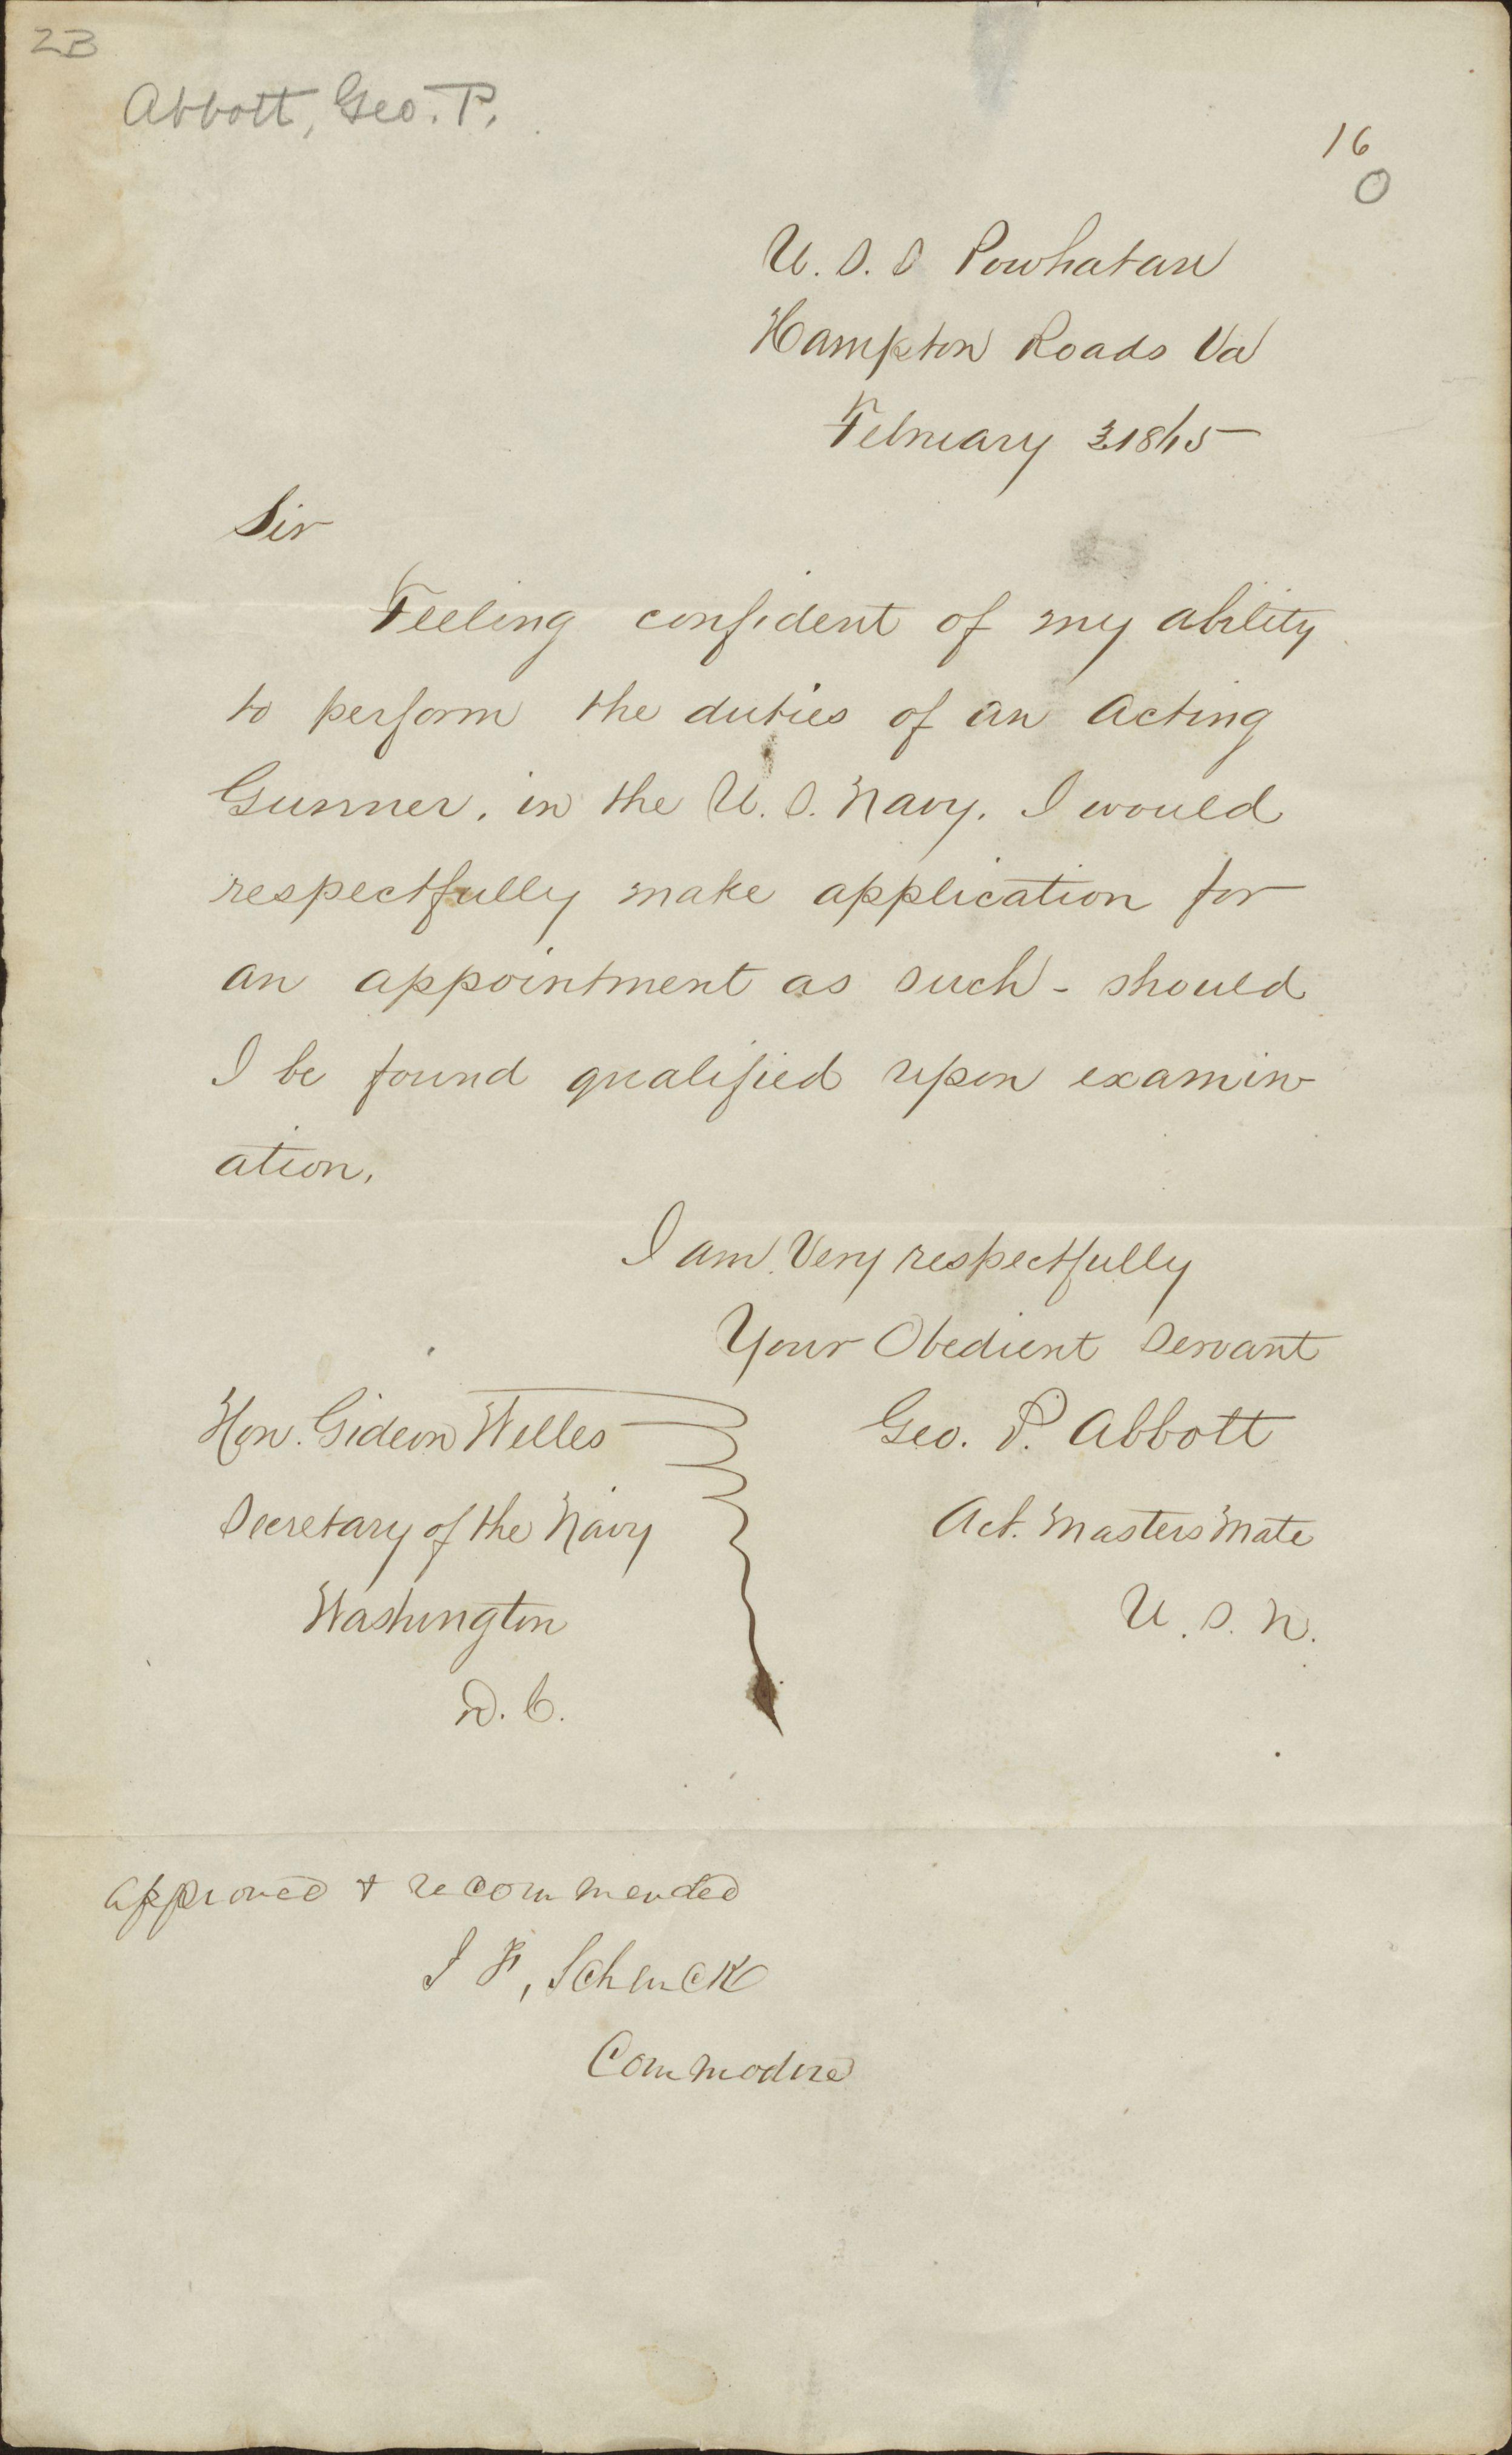 Abbott, George - Letter to Gideon Welles 1815